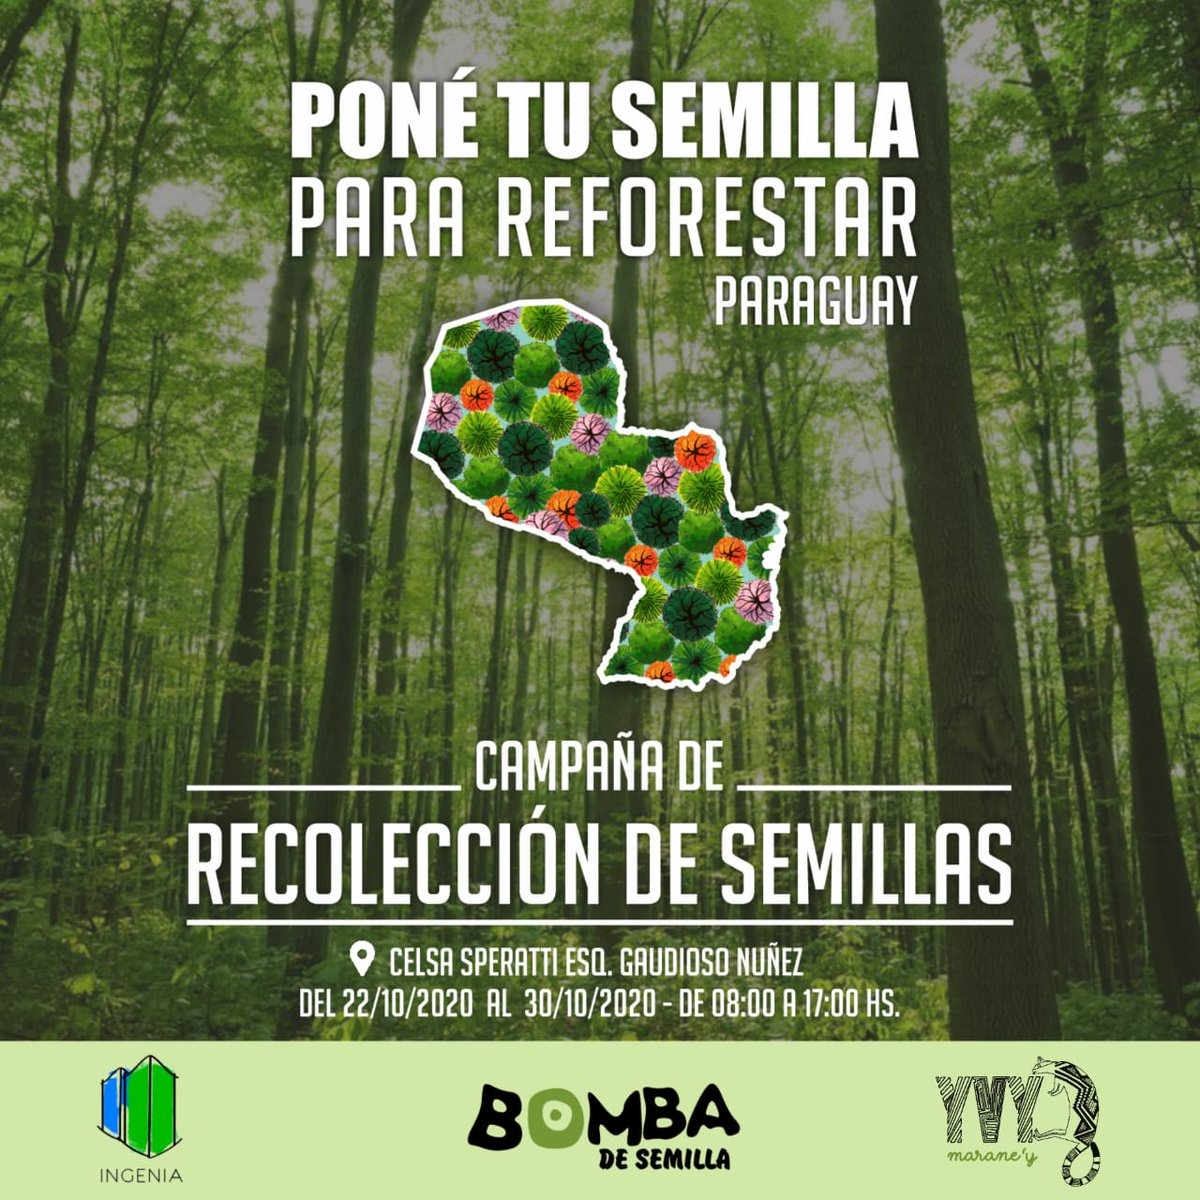 Todas las semillas sirven, pero demos prioridad a árboles nativos:Yvyra pyta, Jacarandá, Lapacho, Timbo, Cedro. @Santula @karenforcado @clariarias @aisman6 @cherovapete_ @CarmiMasi @Drunken_Forest me ayudan con reetwet? Más info en: https://t.co/AGAkpiUHFr https://t.co/QCyHXJoW8n https://t.co/CD1SK72cIc